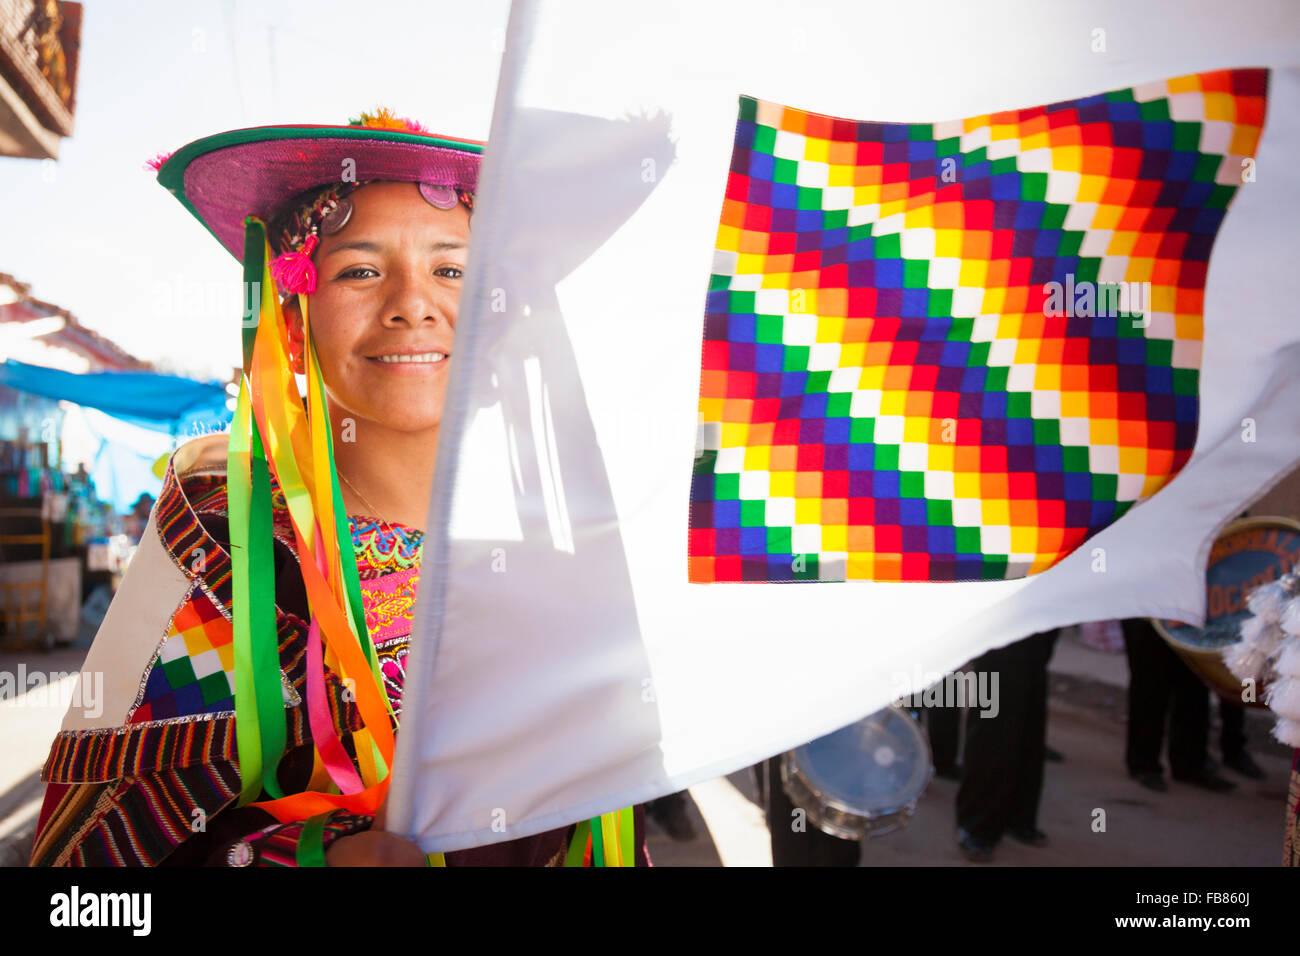 Dancer performing the 'dance of the llama herder' and waving the Aymara flag at the Fiesta de Nuestra Señora - Stock Image